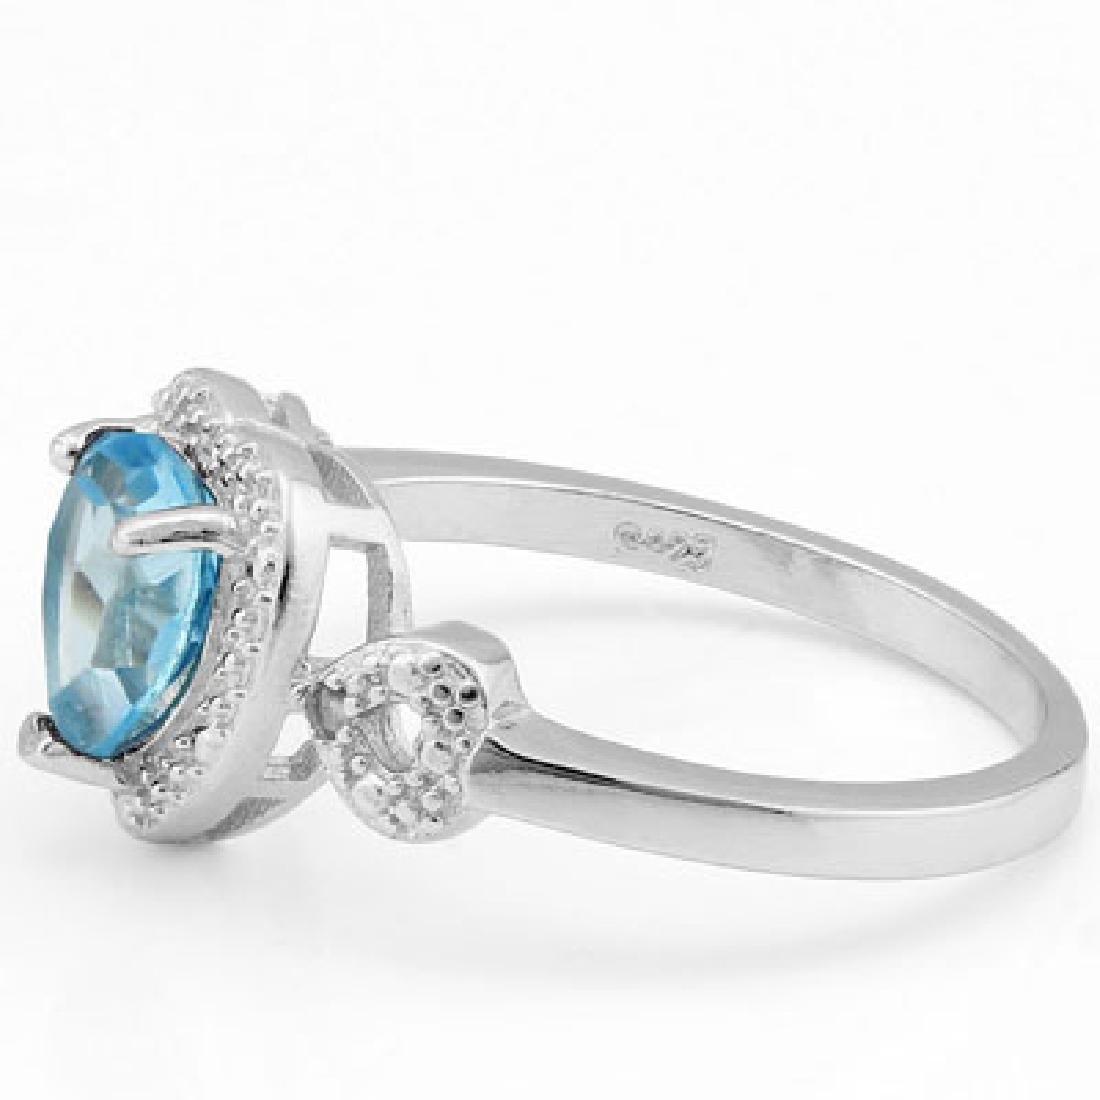 1.412 CARAT TW BLUE TOPAZ & GENUINE DIAMOND PLATINUM OV